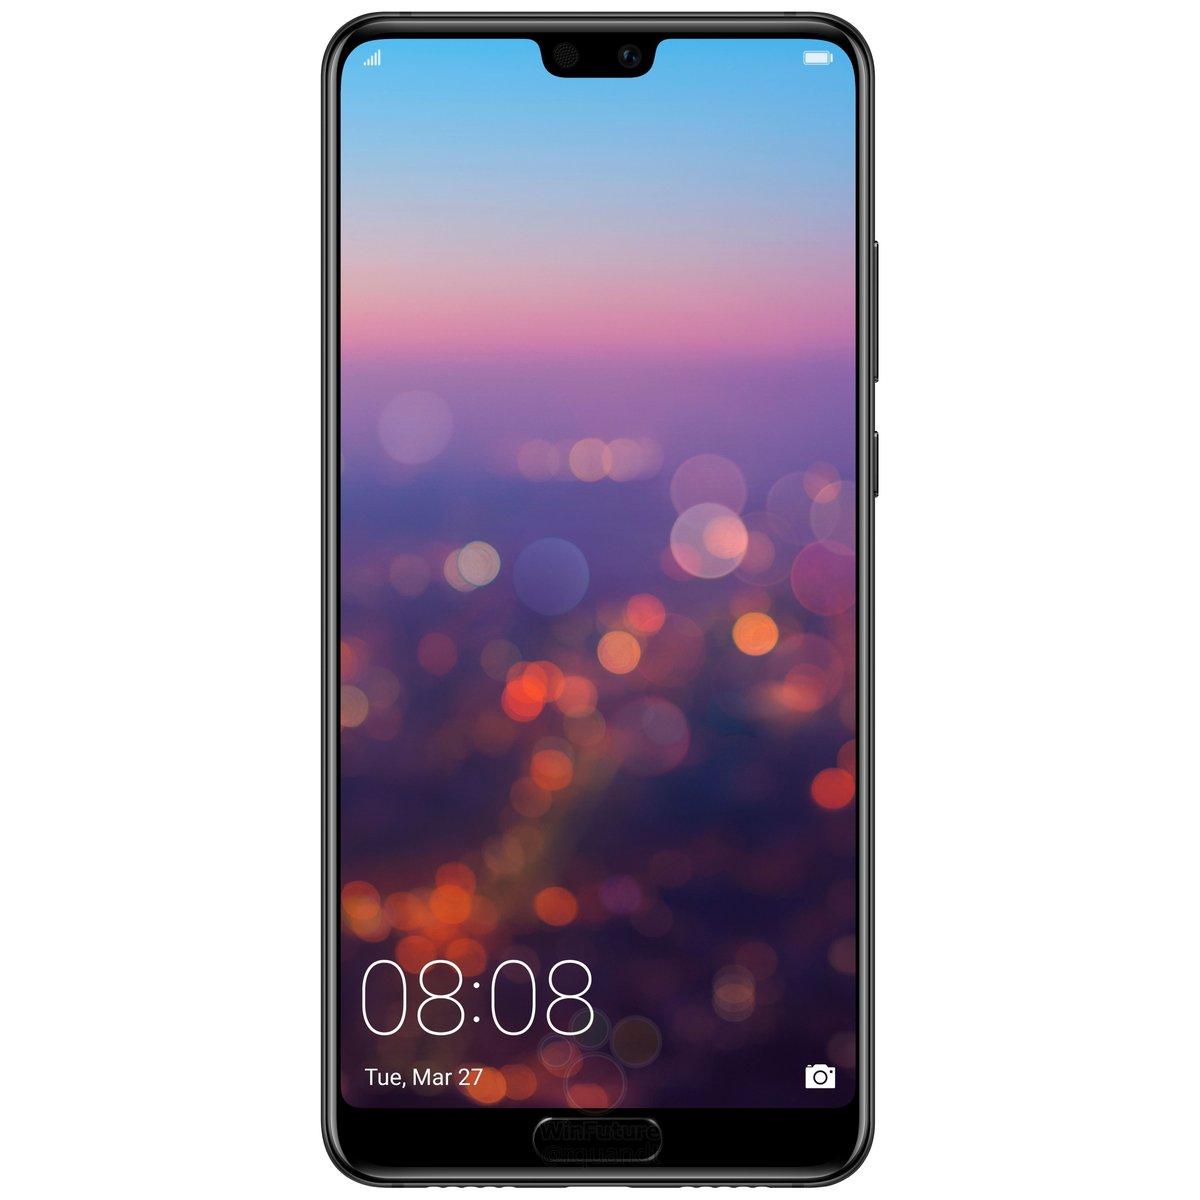 Результат тестирования Huawei P20 вGeekbench науровне Galaxy S8